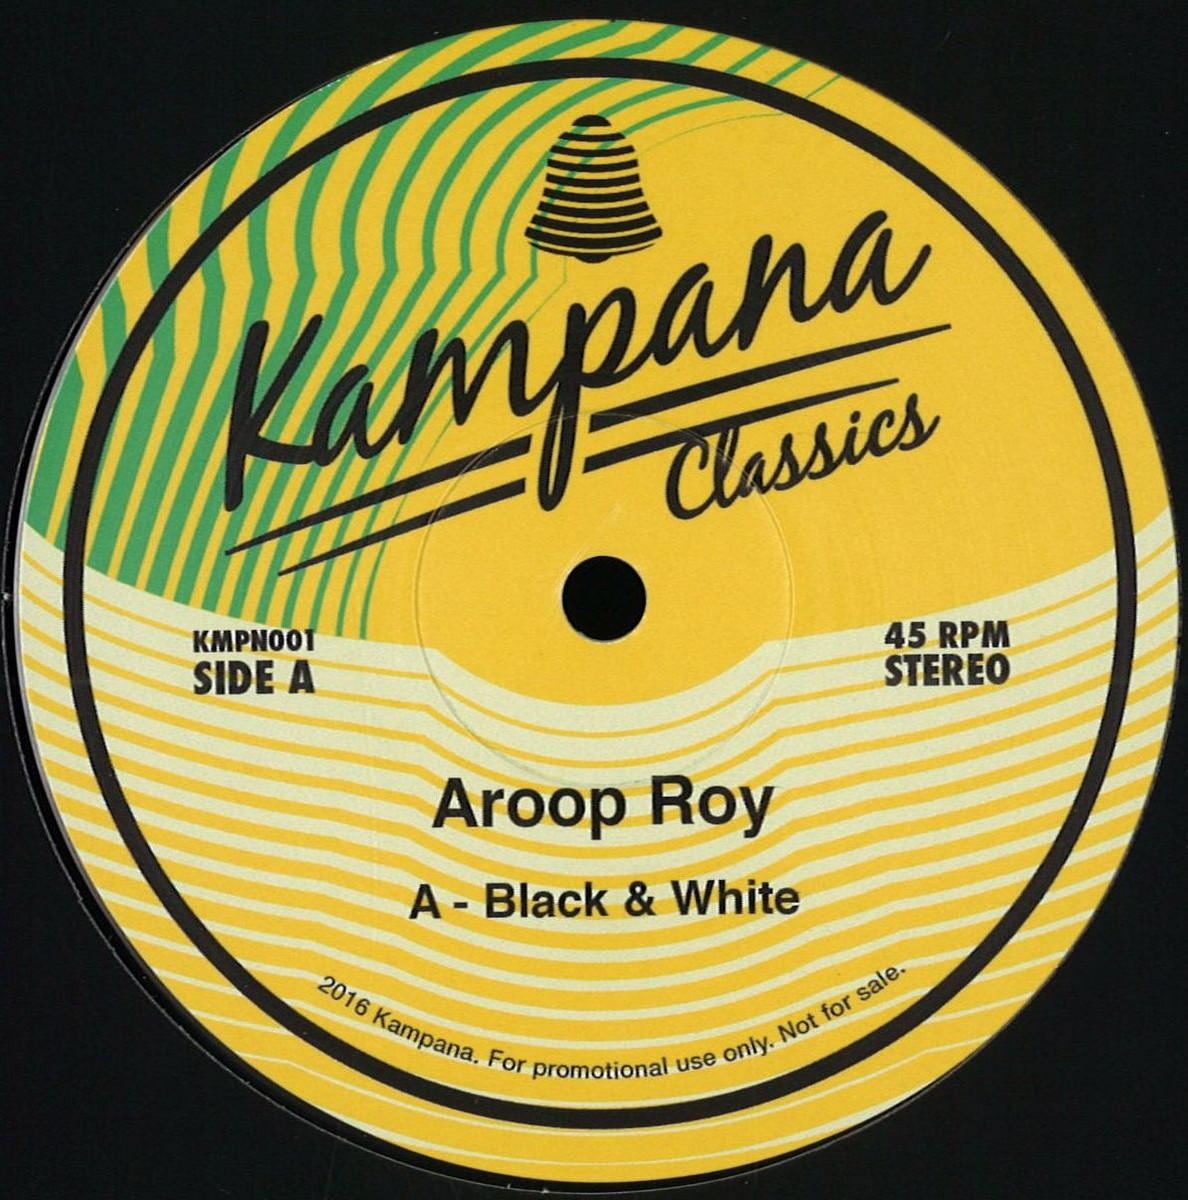 Aroop Roy Classics Kampana Kmpn001 Vinyl